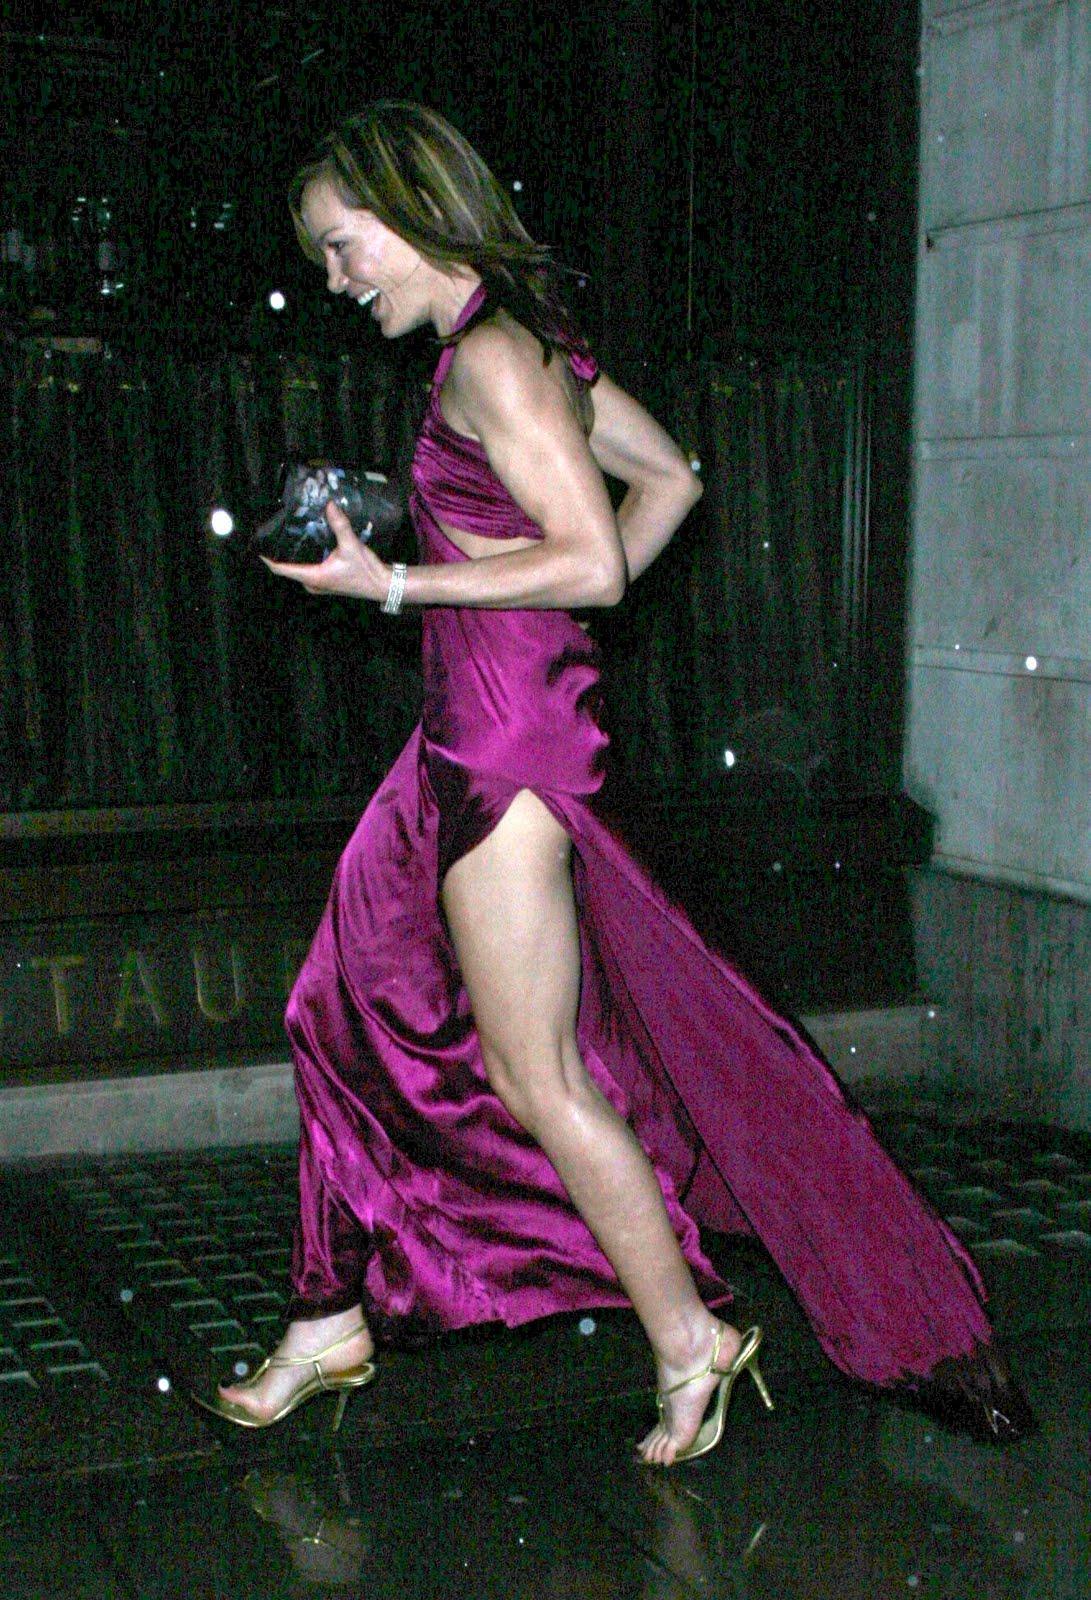 http://2.bp.blogspot.com/-AJDfO7RaFjM/TYSwvDETN3I/AAAAAAAAC88/2-ZrezHU25M/s1600/tara_palmer_tomkinson_legs_1.jpg